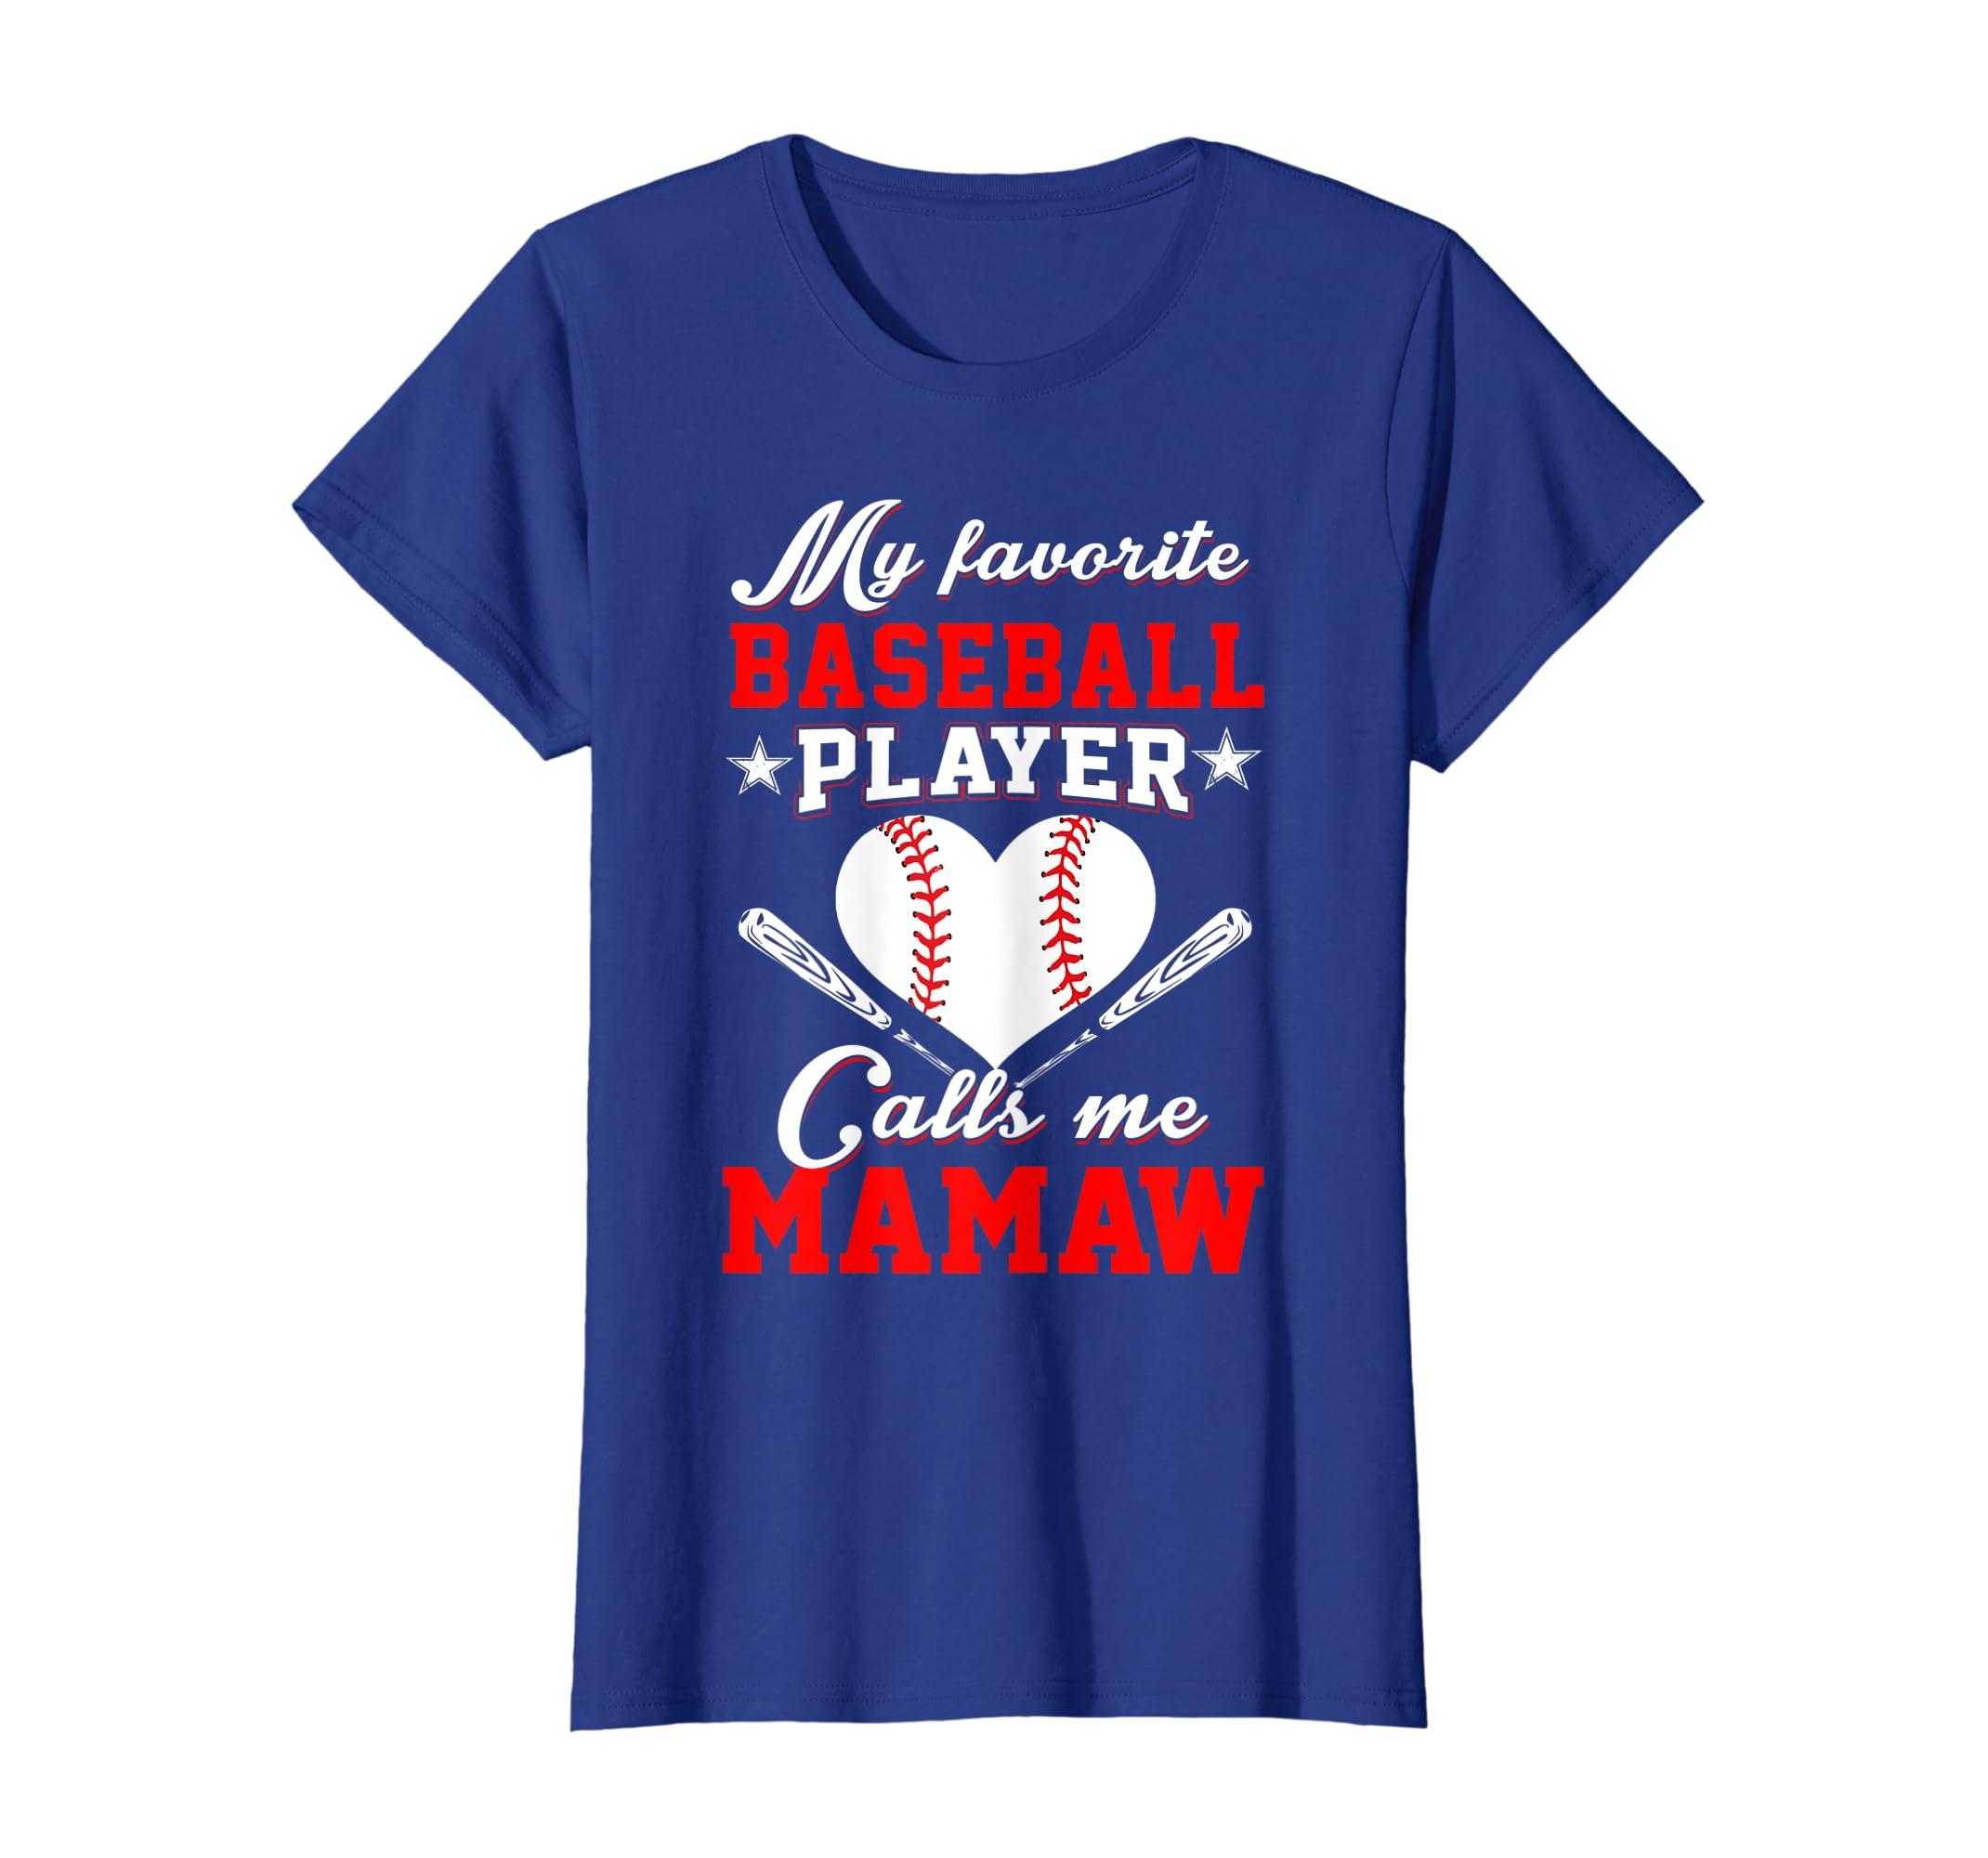 e2a3d45f6 Amazon.com: Womens My Favorite Baseball Player Calls Me Mamaw T Shirt:  Clothing